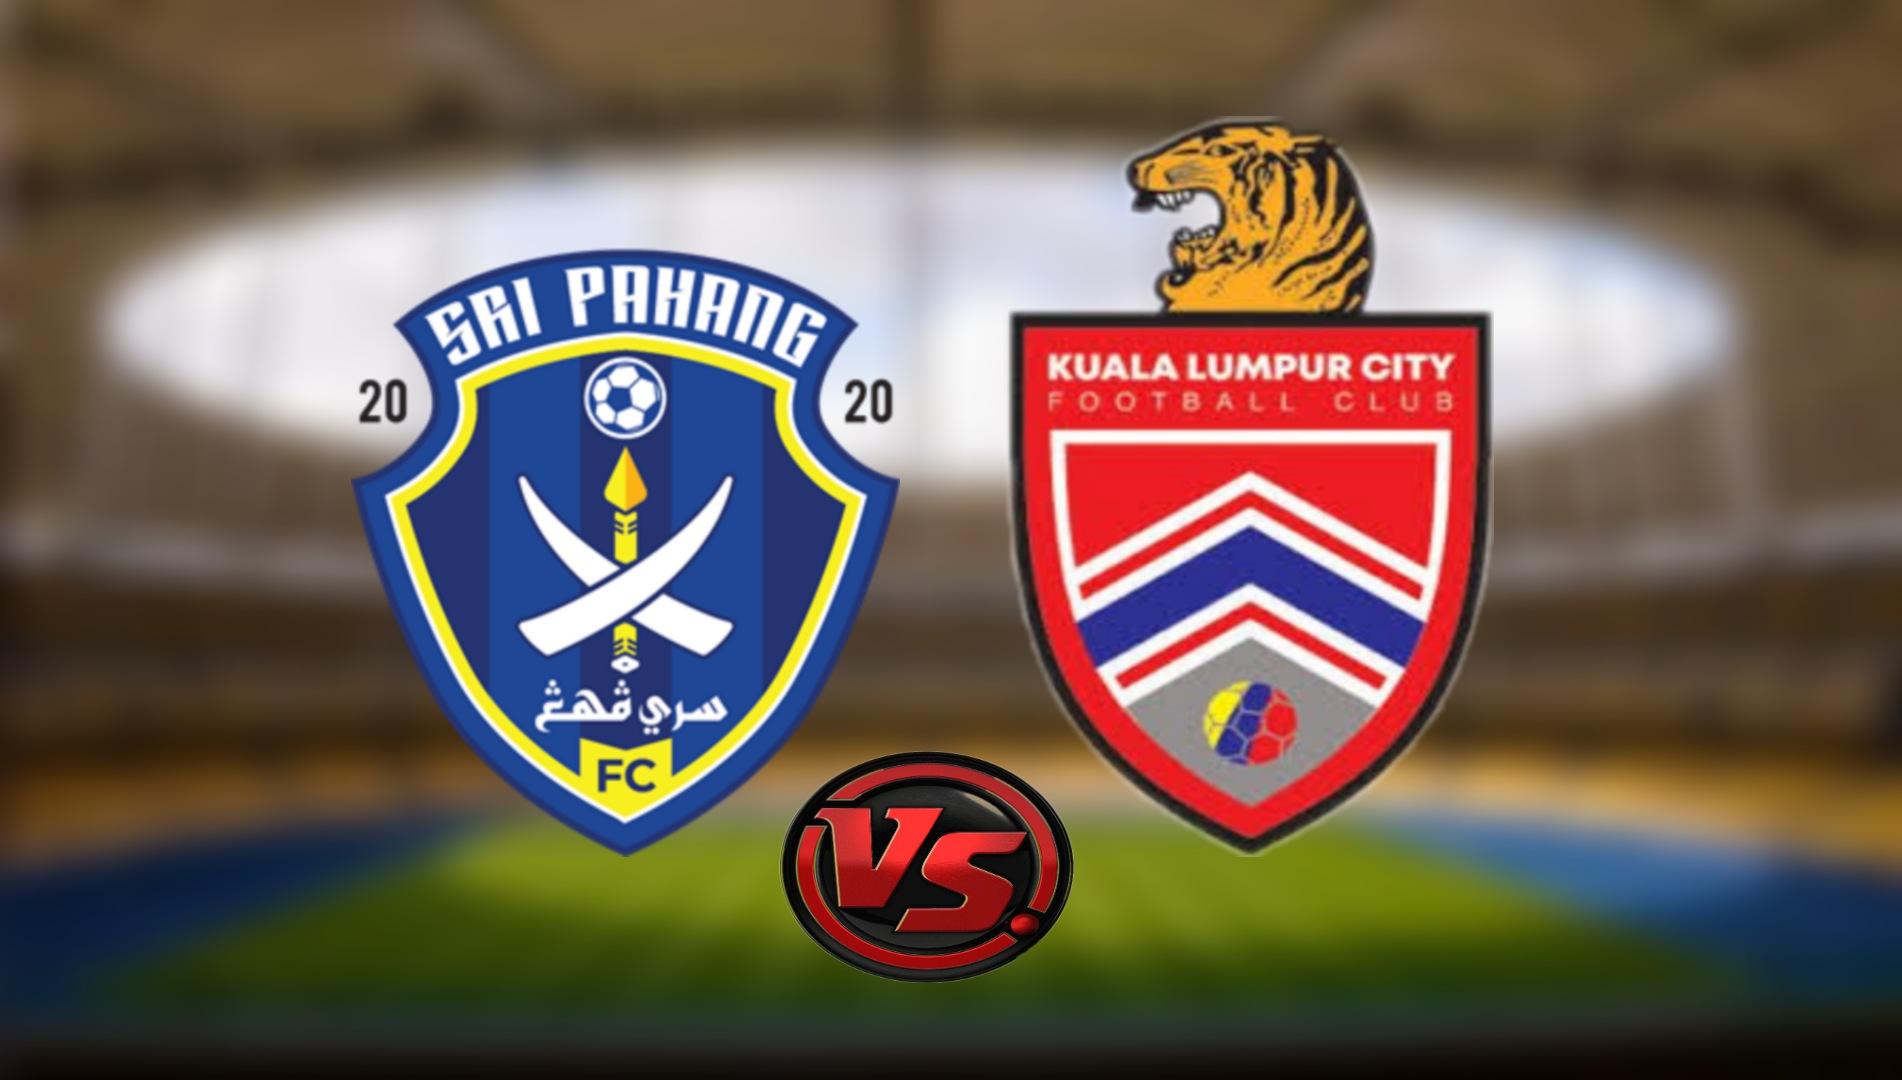 Live Streaming Sri Pahang FC vs Kuala Lumpur City FC Liga Super 20.8.2021